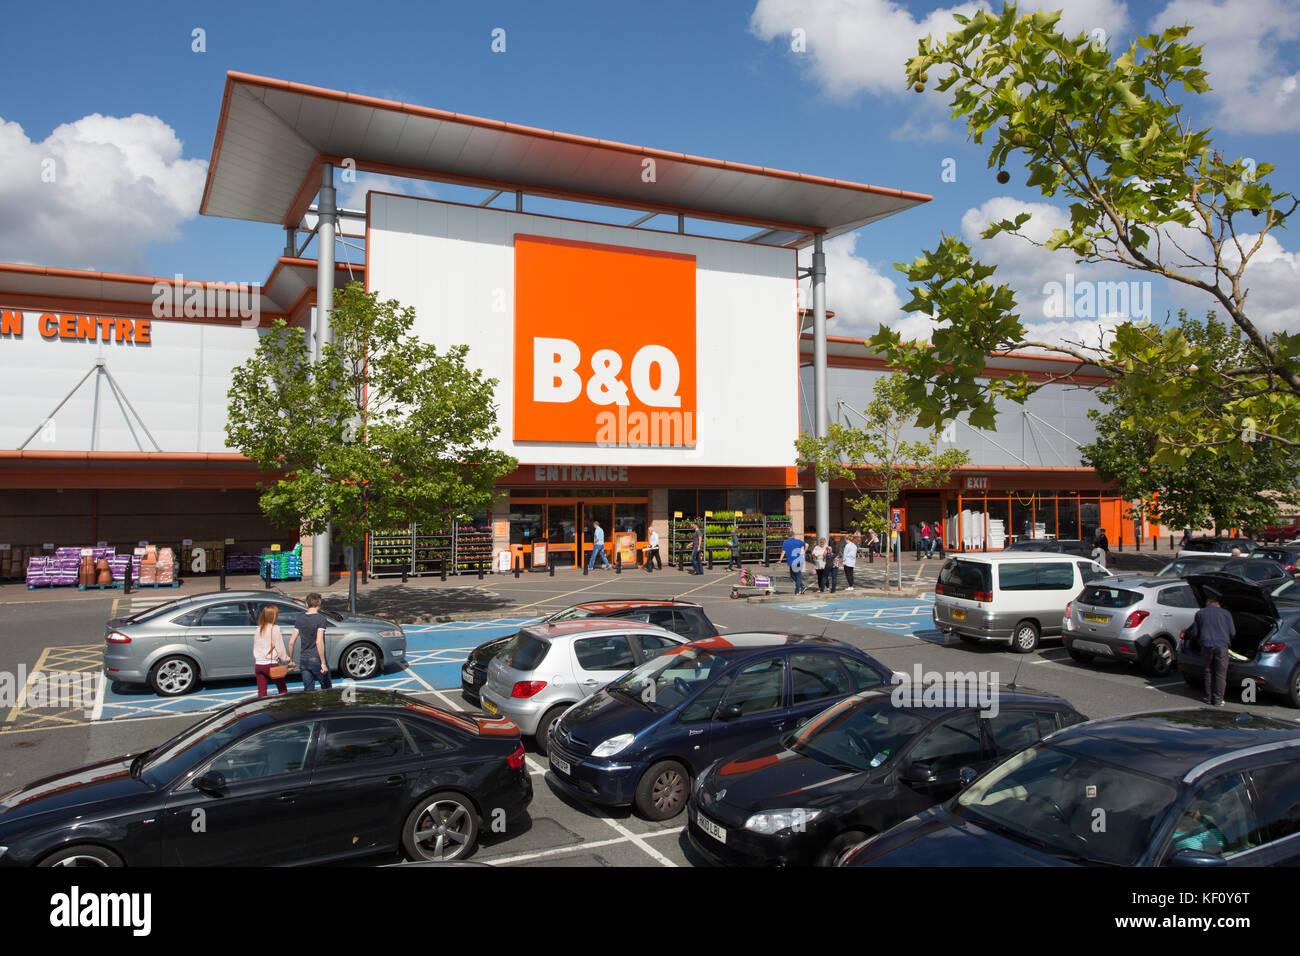 b&q stockport